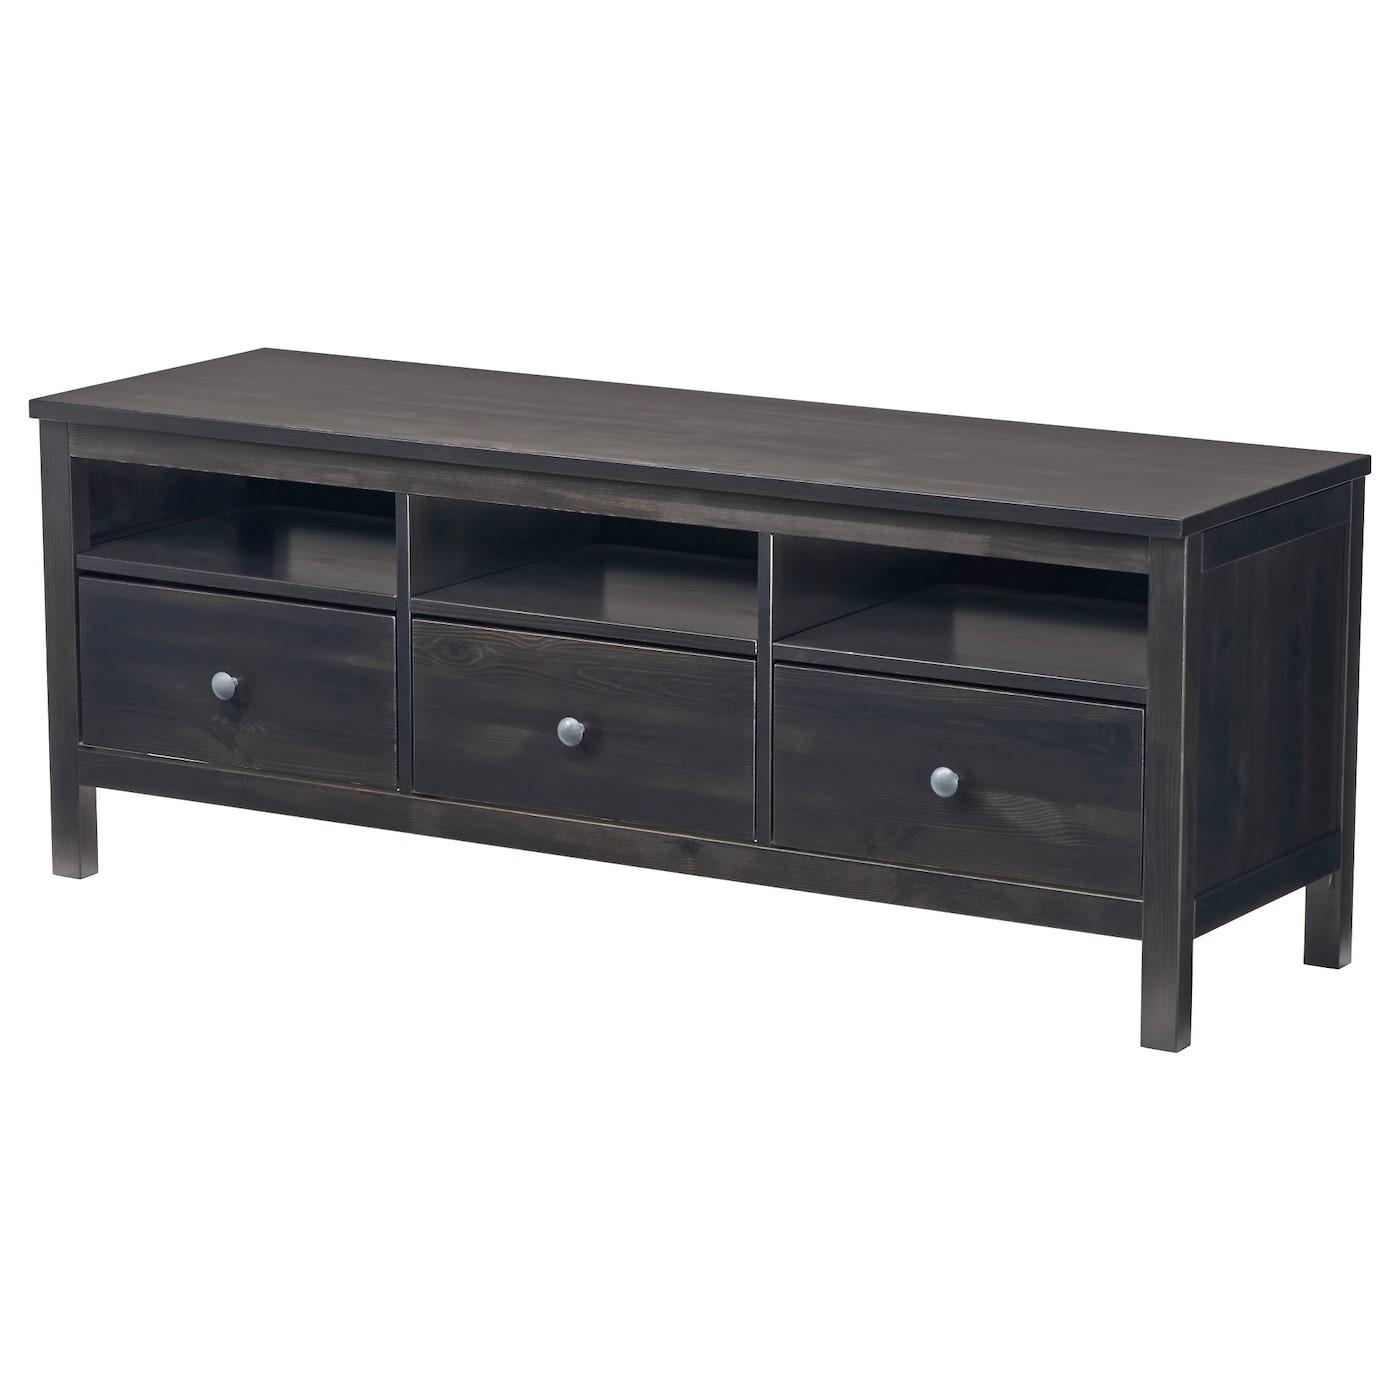 hemnes tv bench black brown 148 x 47 x 57 cm ikea. Black Bedroom Furniture Sets. Home Design Ideas